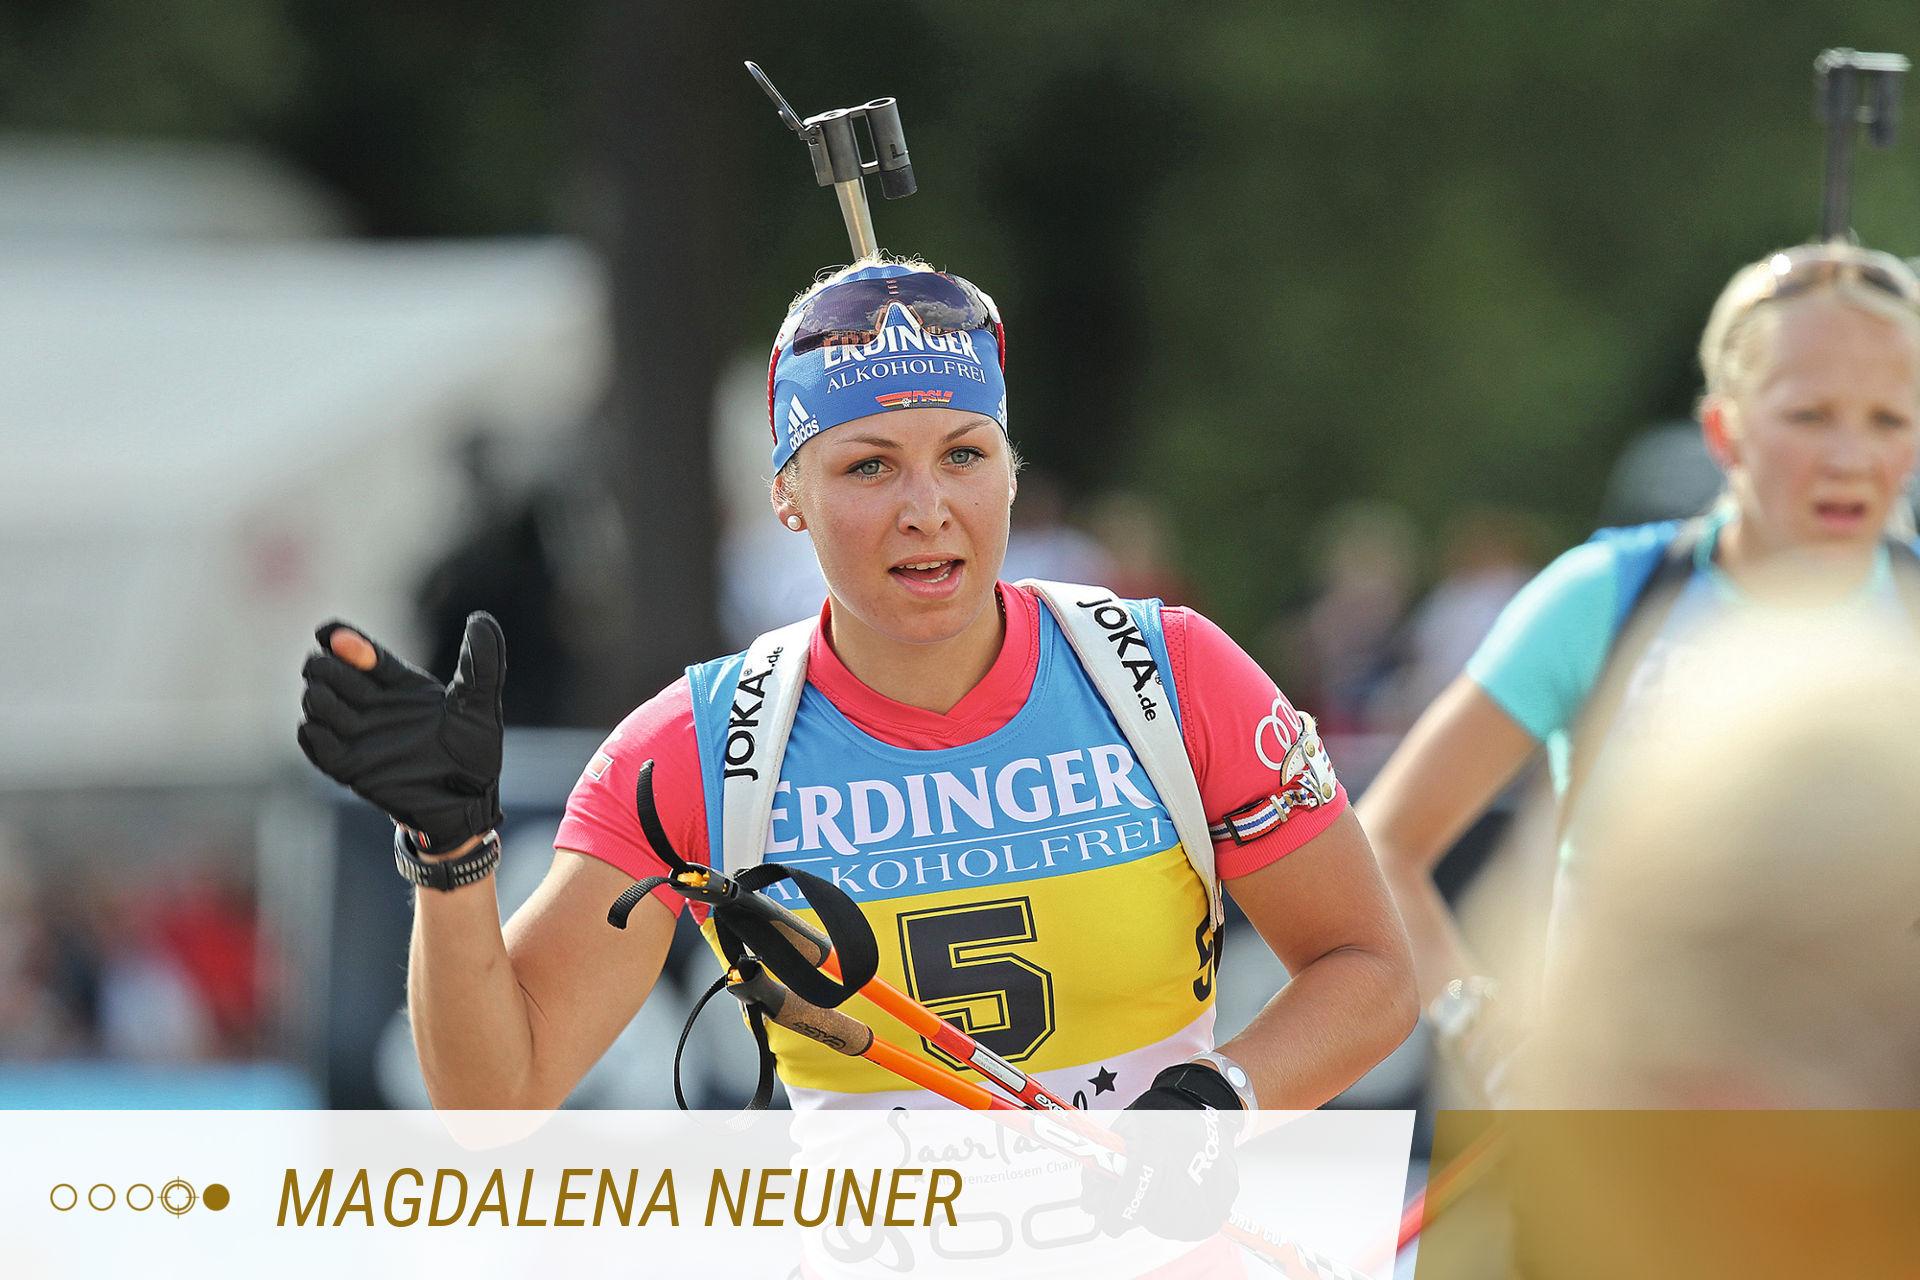 Athleten_Historie_MagdalenaNeuner